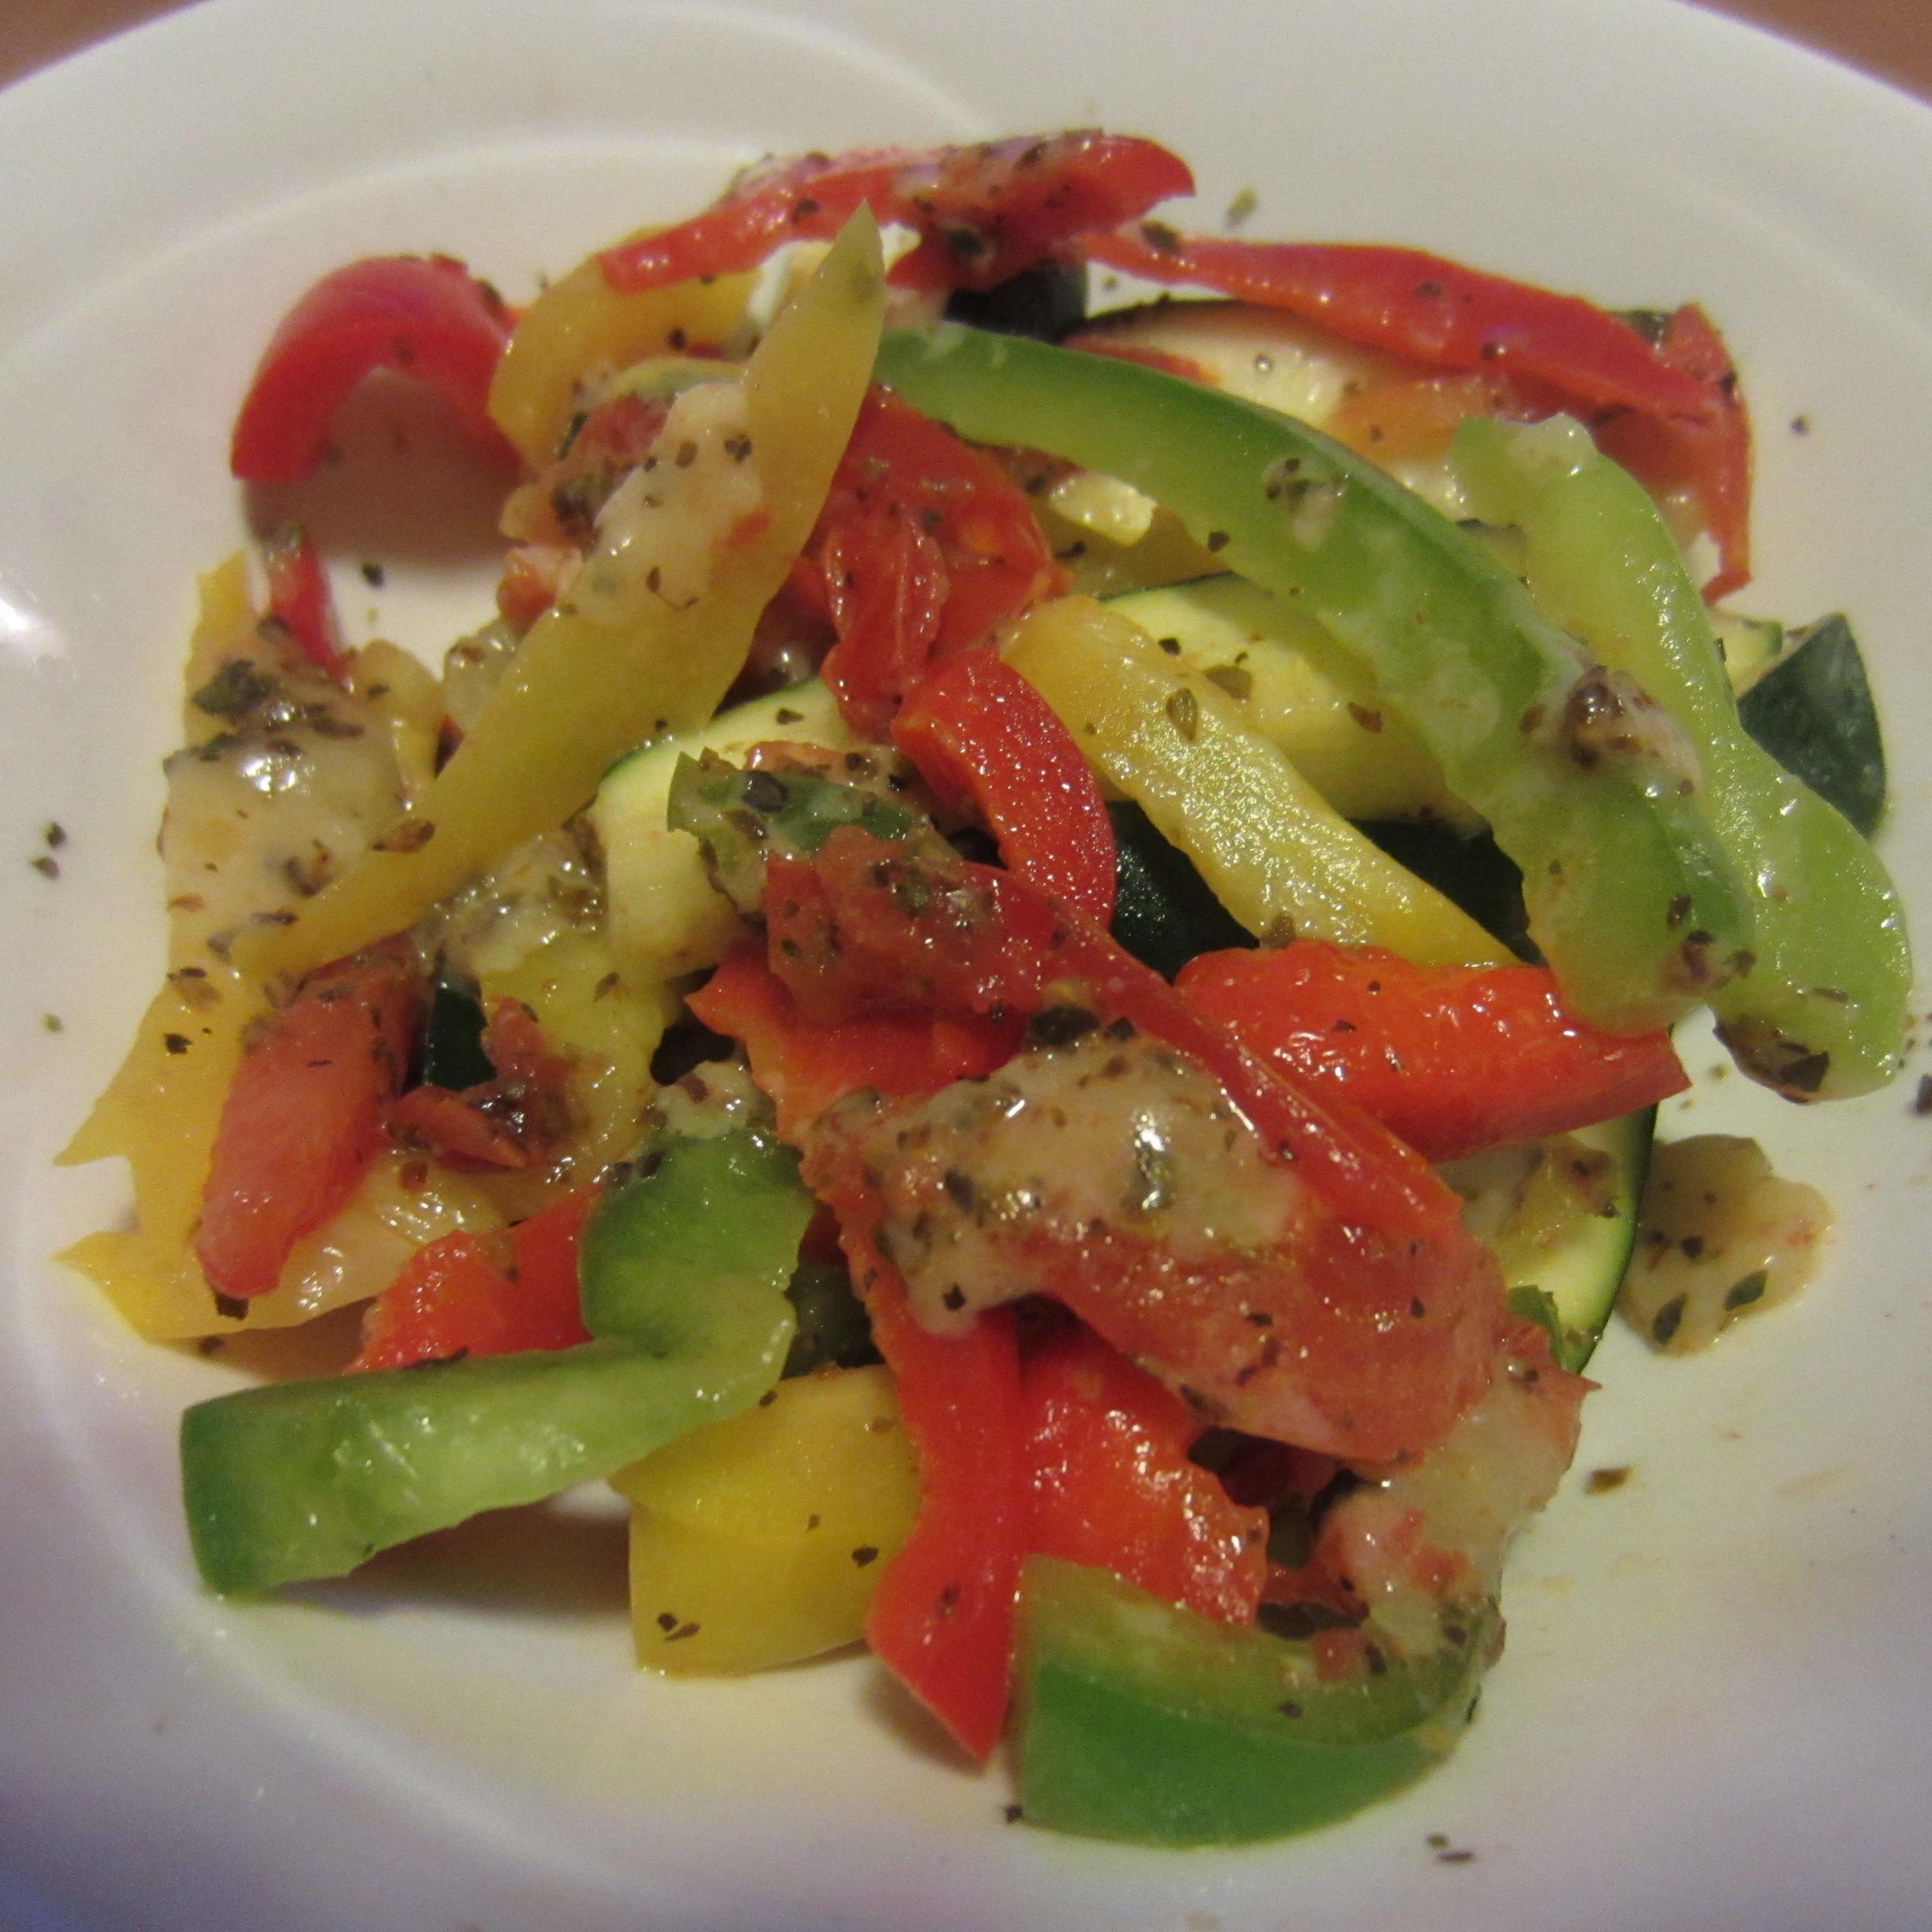 Zucchini & Pepper salad with Cheddar